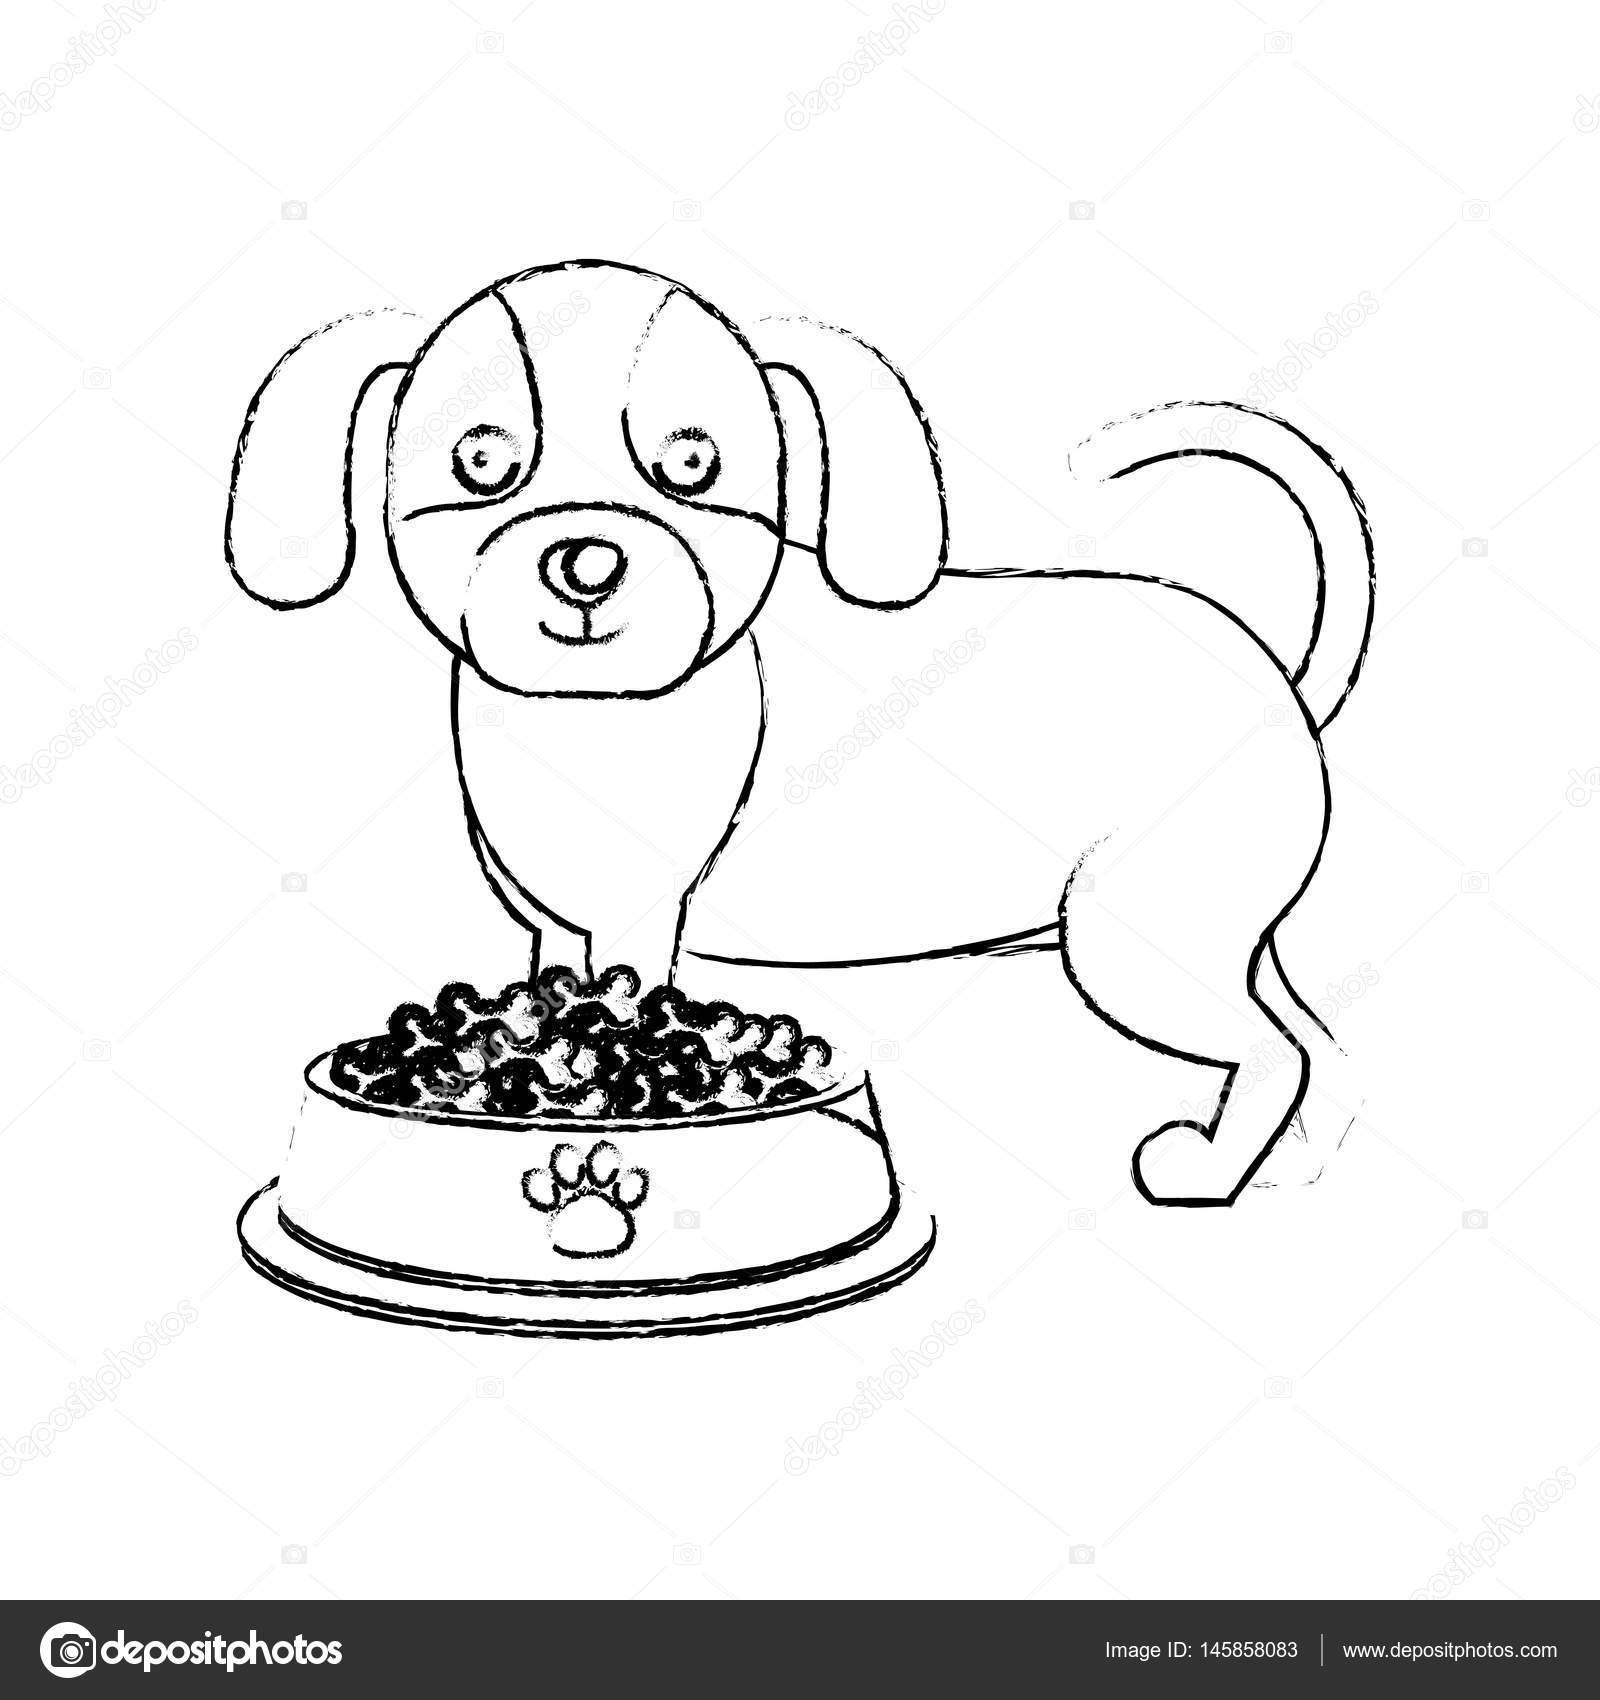 Familia De Osos Tiernos Lindo Icono De Mascotas Doggy Vector De